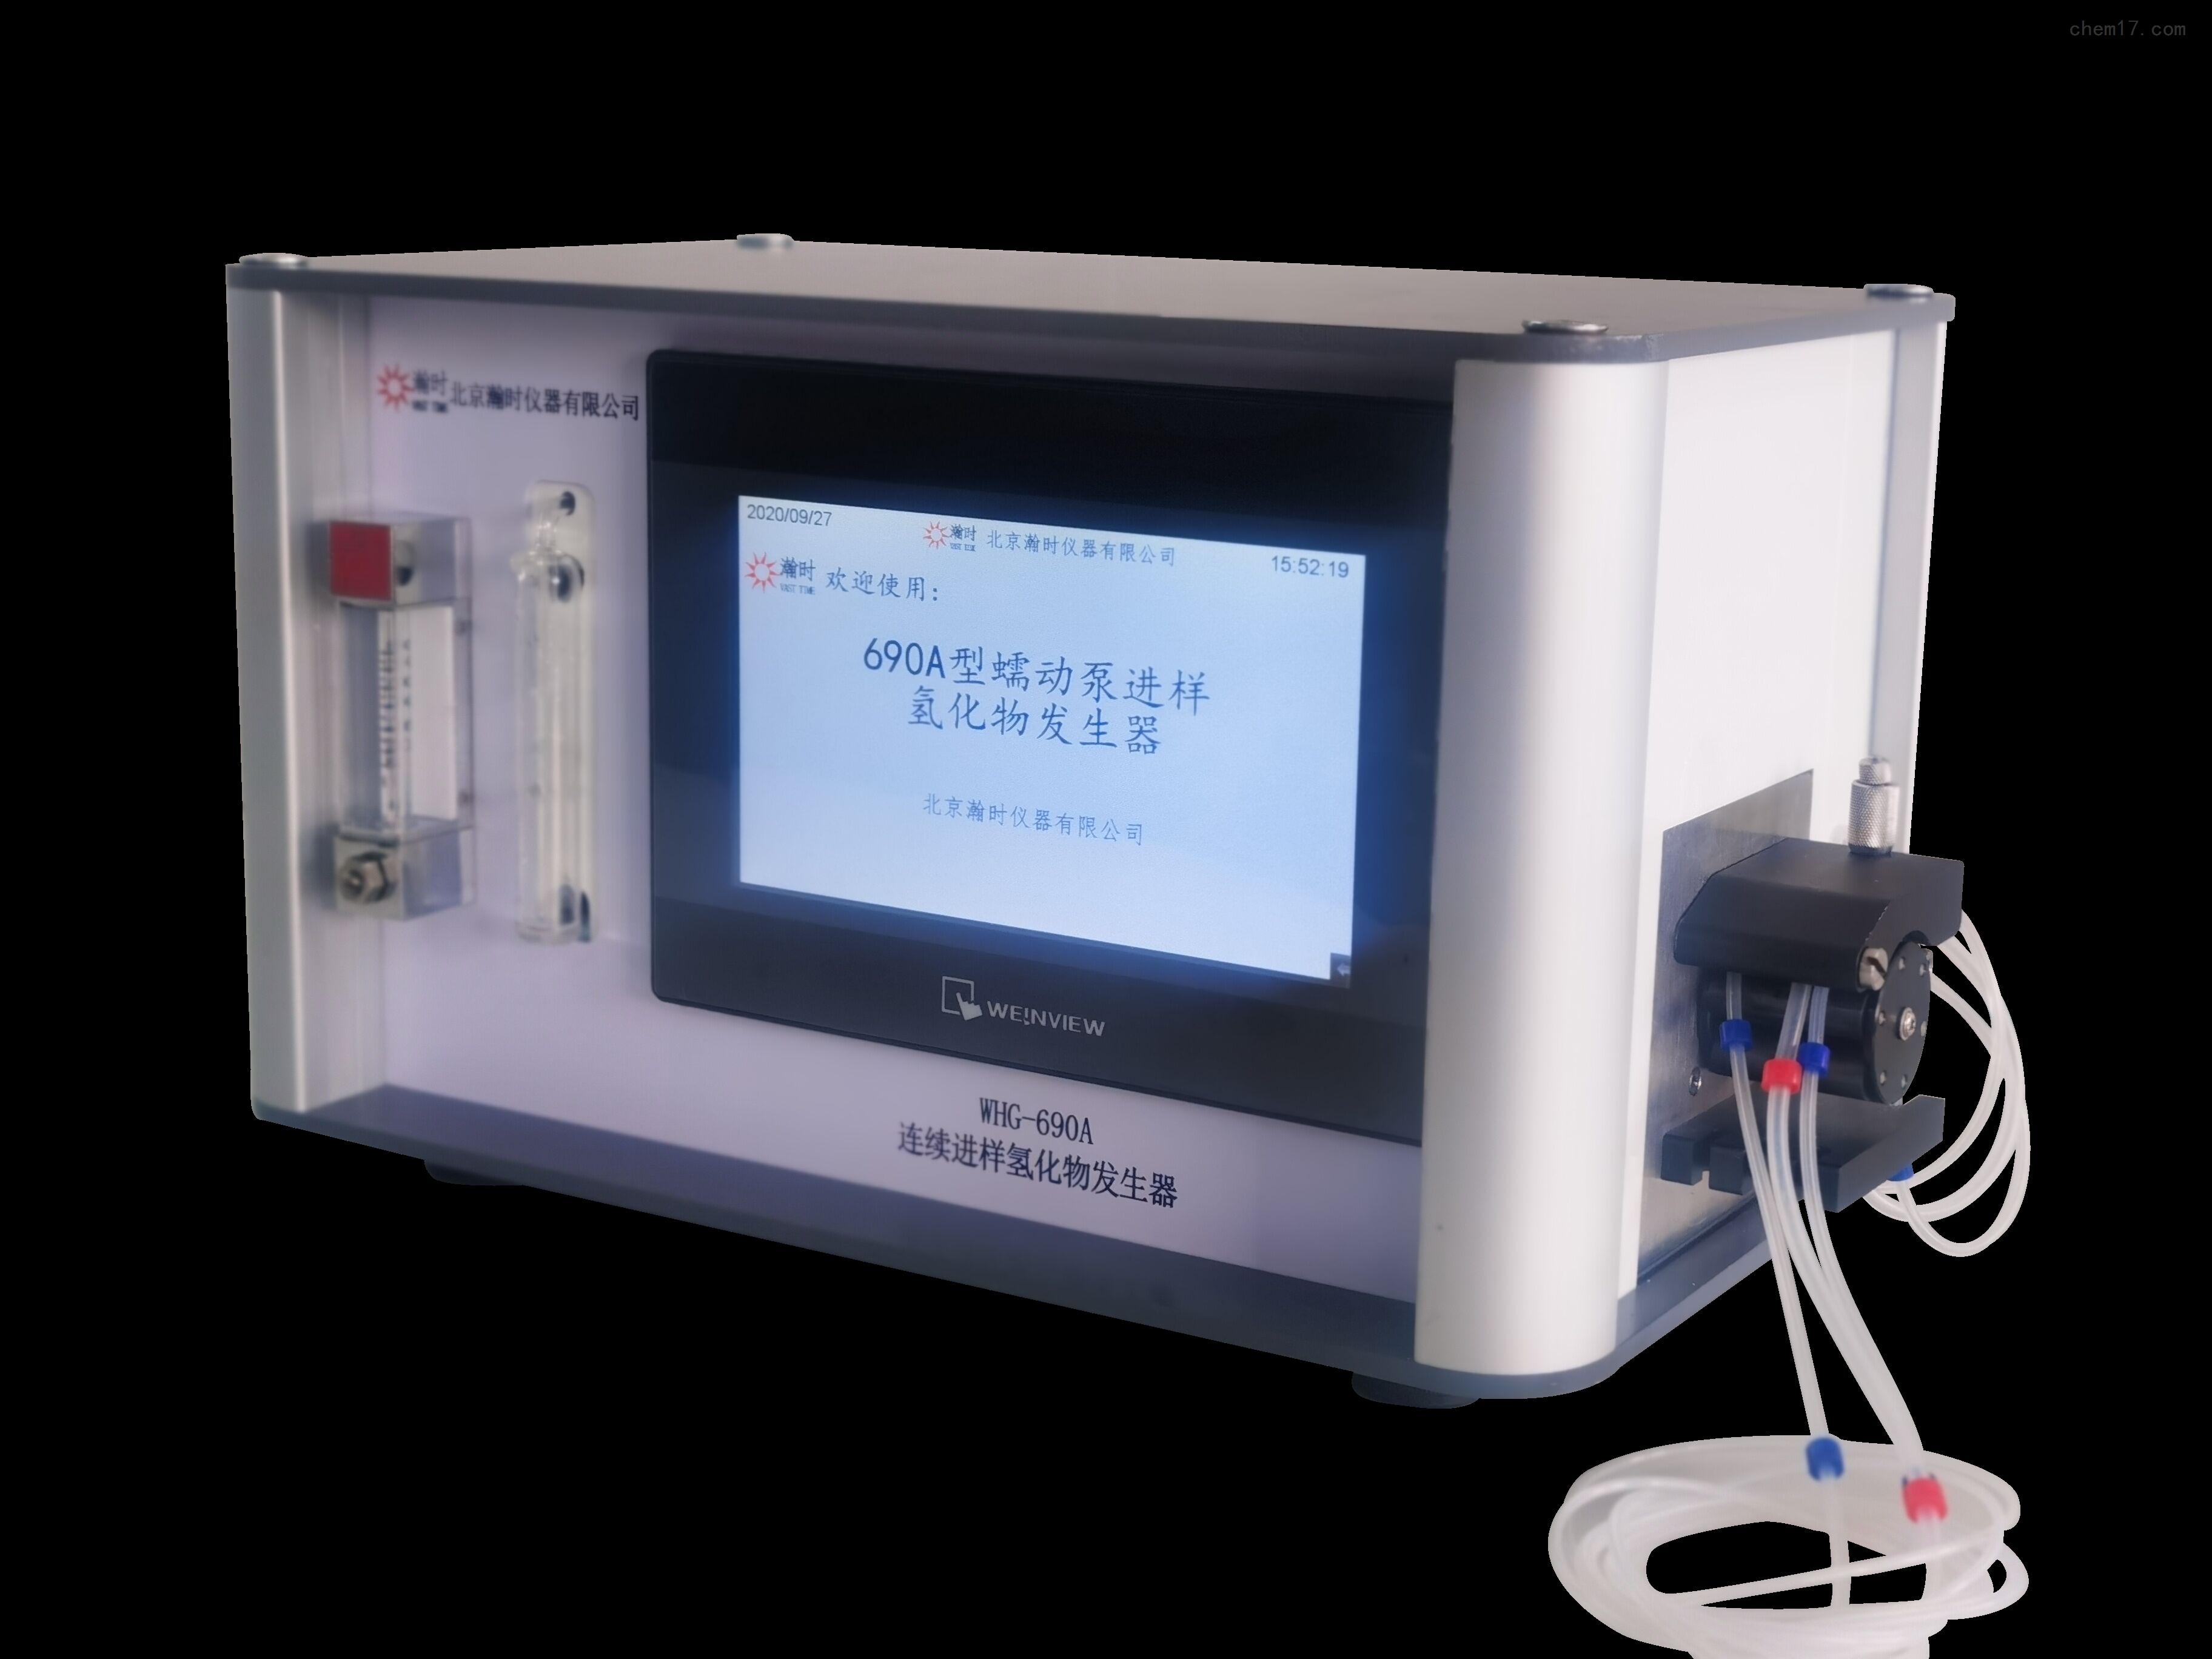 WHG-690A-配PE蠕动泵进样型氢化物发生器